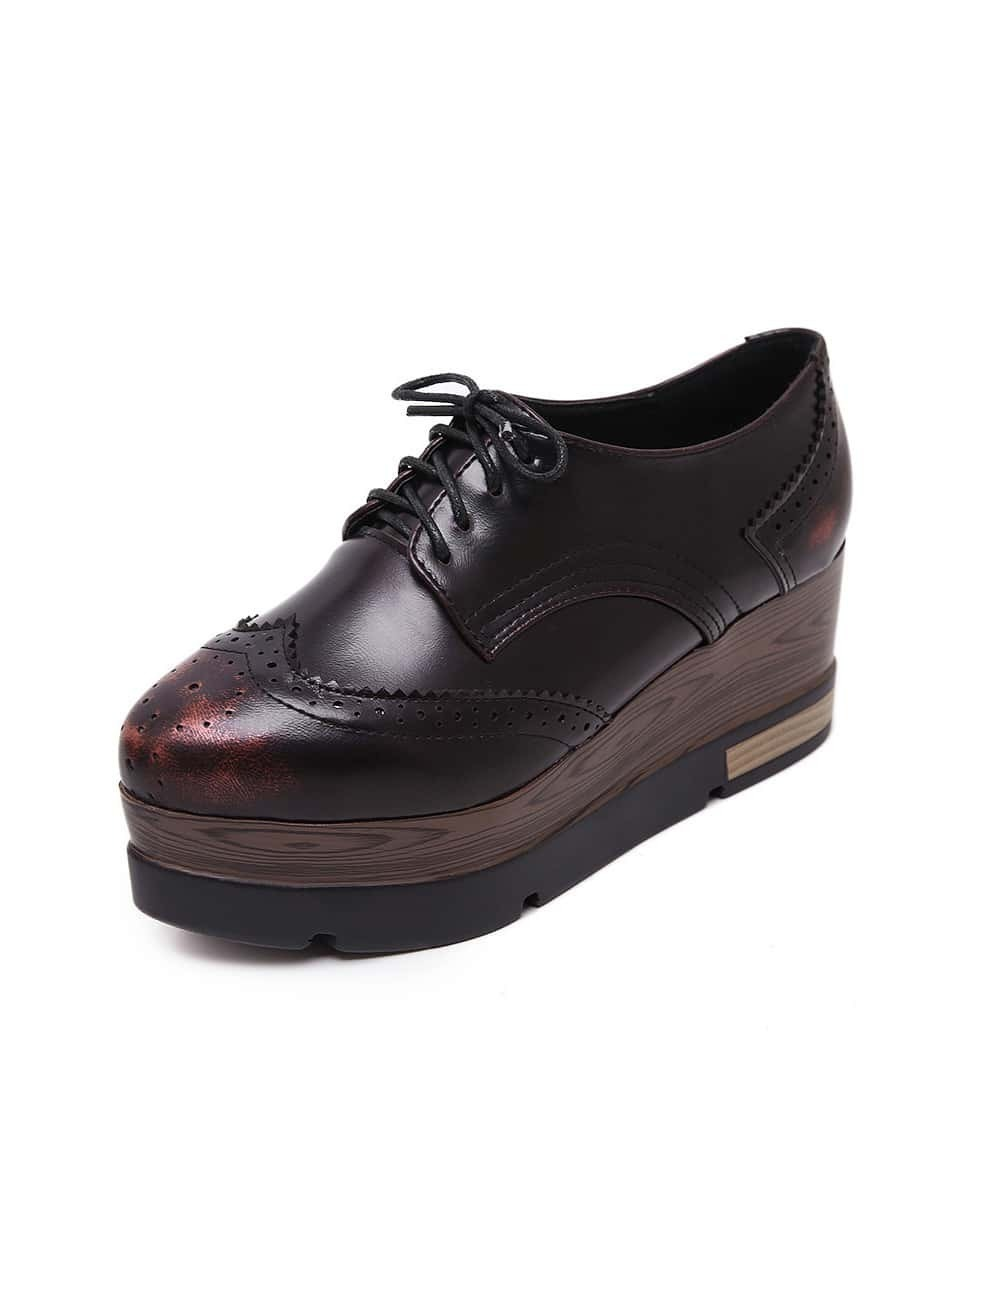 chaussure semelle compens e avec lacets rouge french romwe. Black Bedroom Furniture Sets. Home Design Ideas